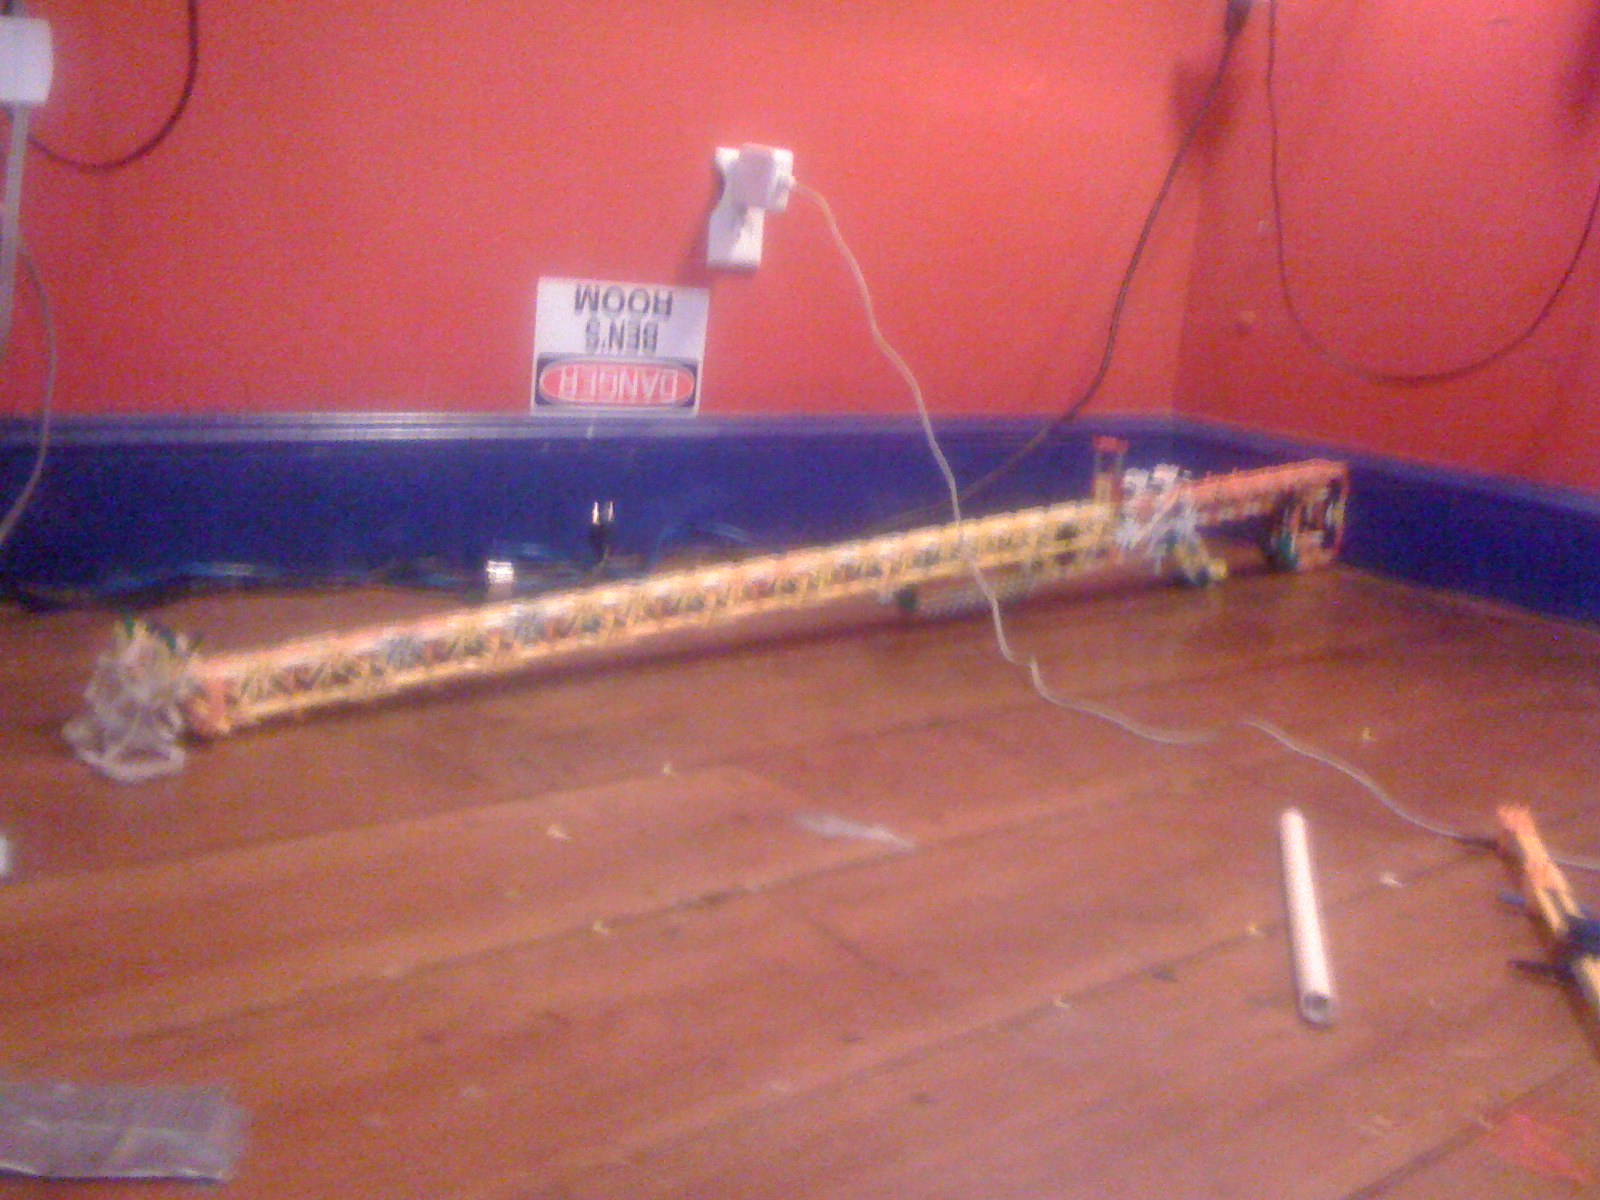 The B.s.r Raptor... the longest range Knex sniper rifle in history